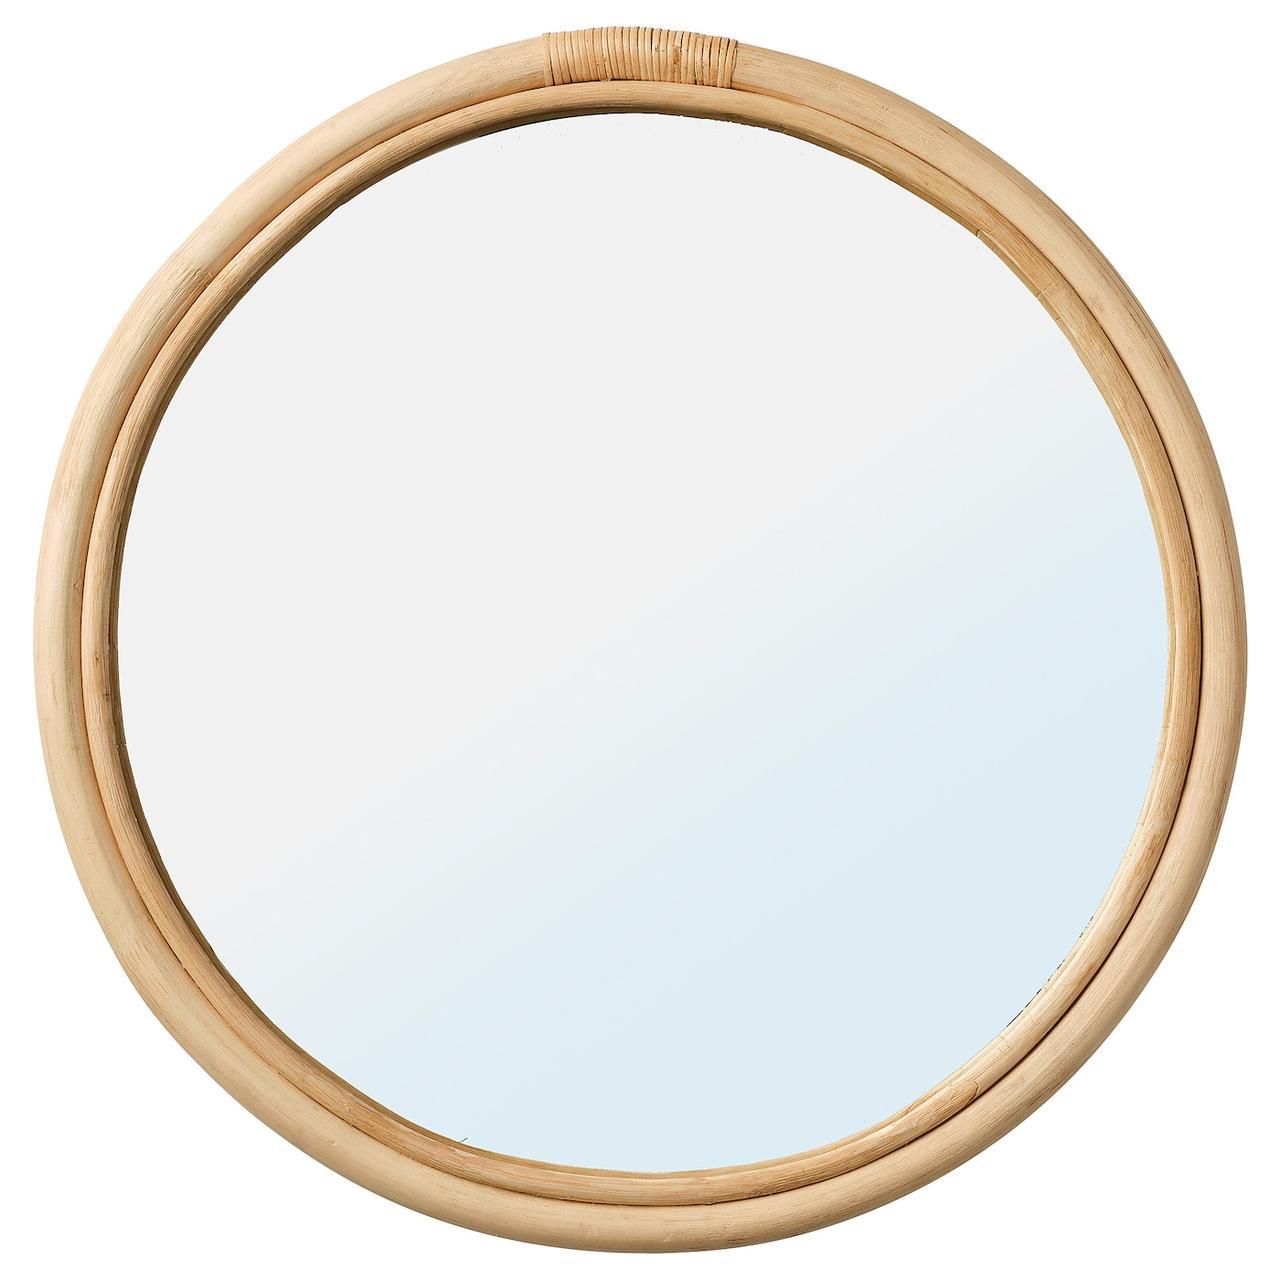 IKEA HINDÅS Зеркало ротанг 50 см